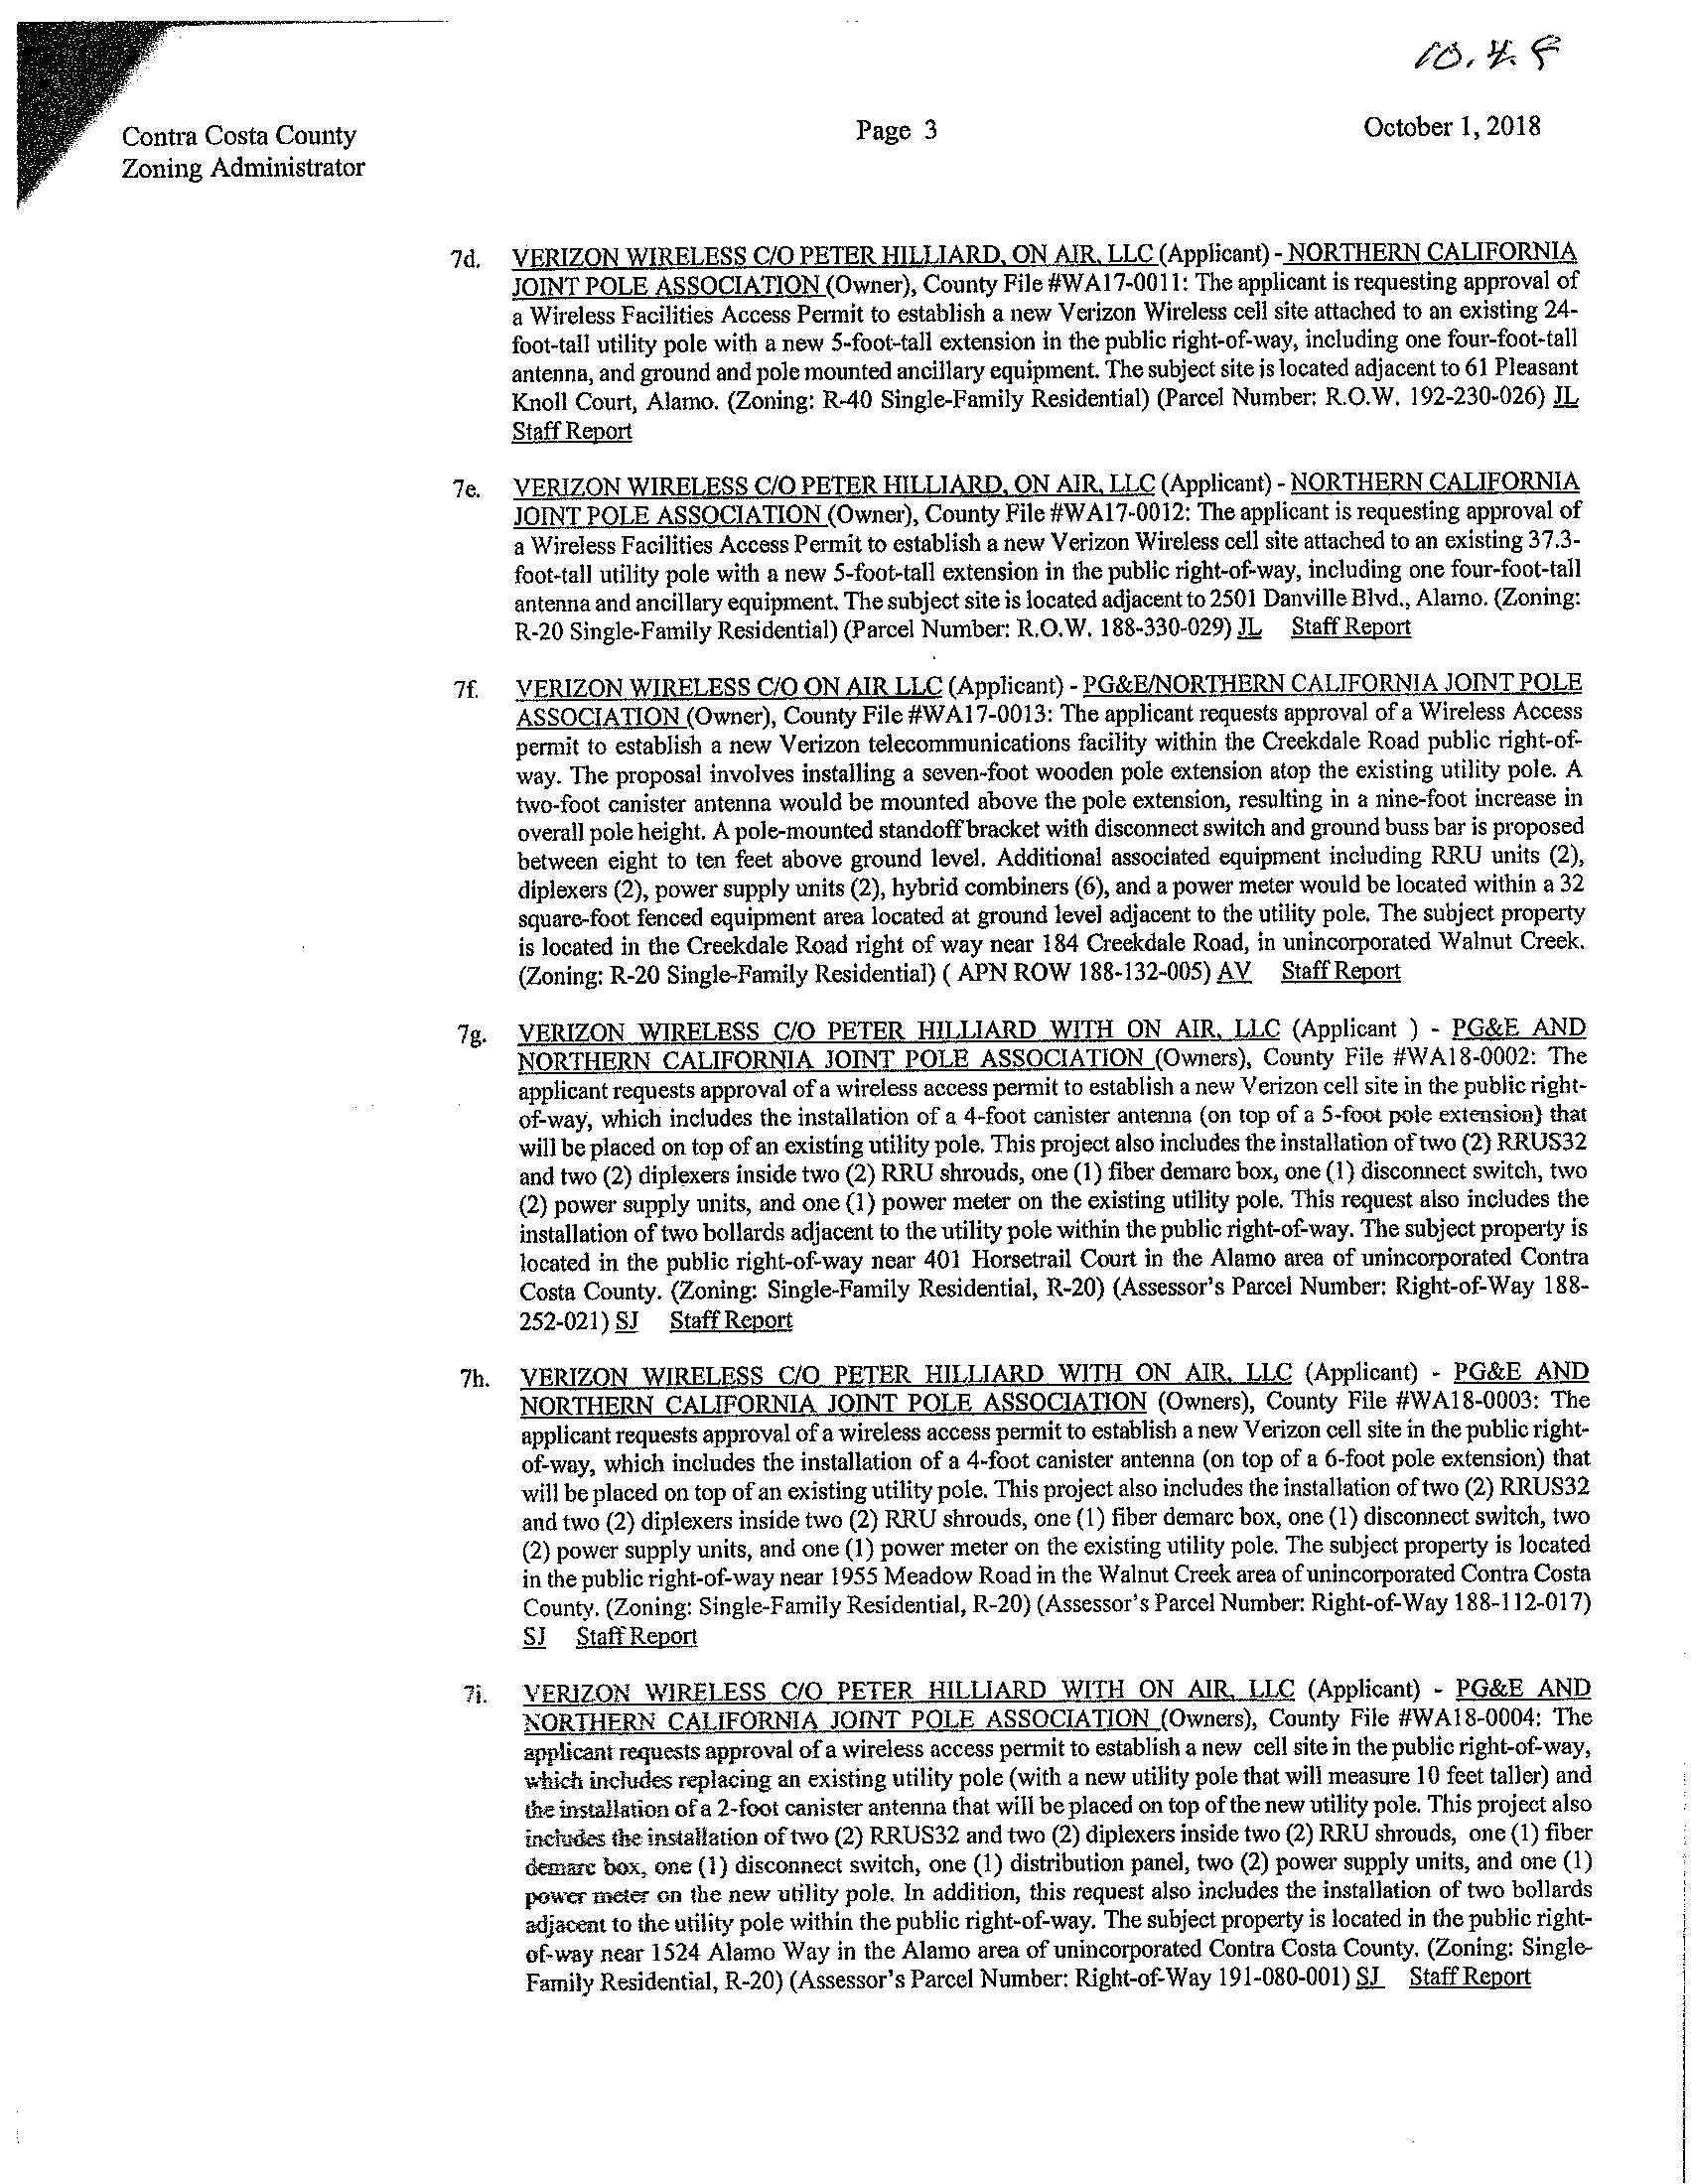 ESMAC Agenda 10.10.2018 (32 Pages)_31.jpg